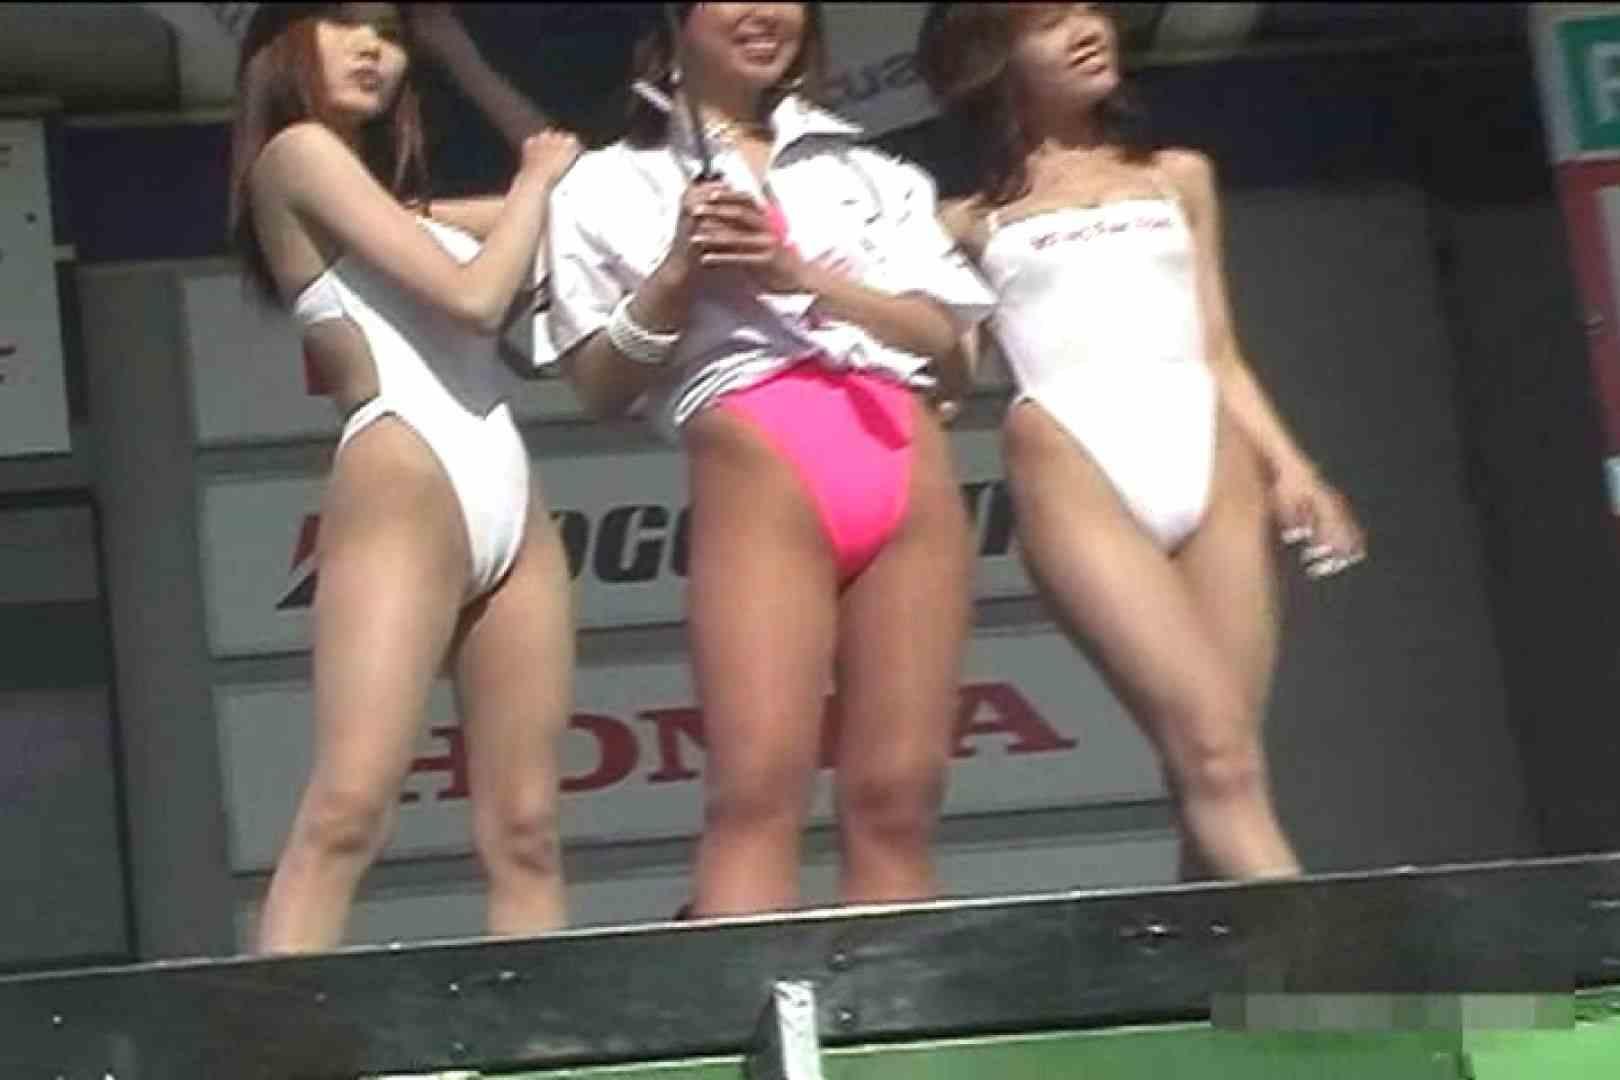 RQカメラ地獄Vol.14 エロティックなOL スケベ動画紹介 71画像 59